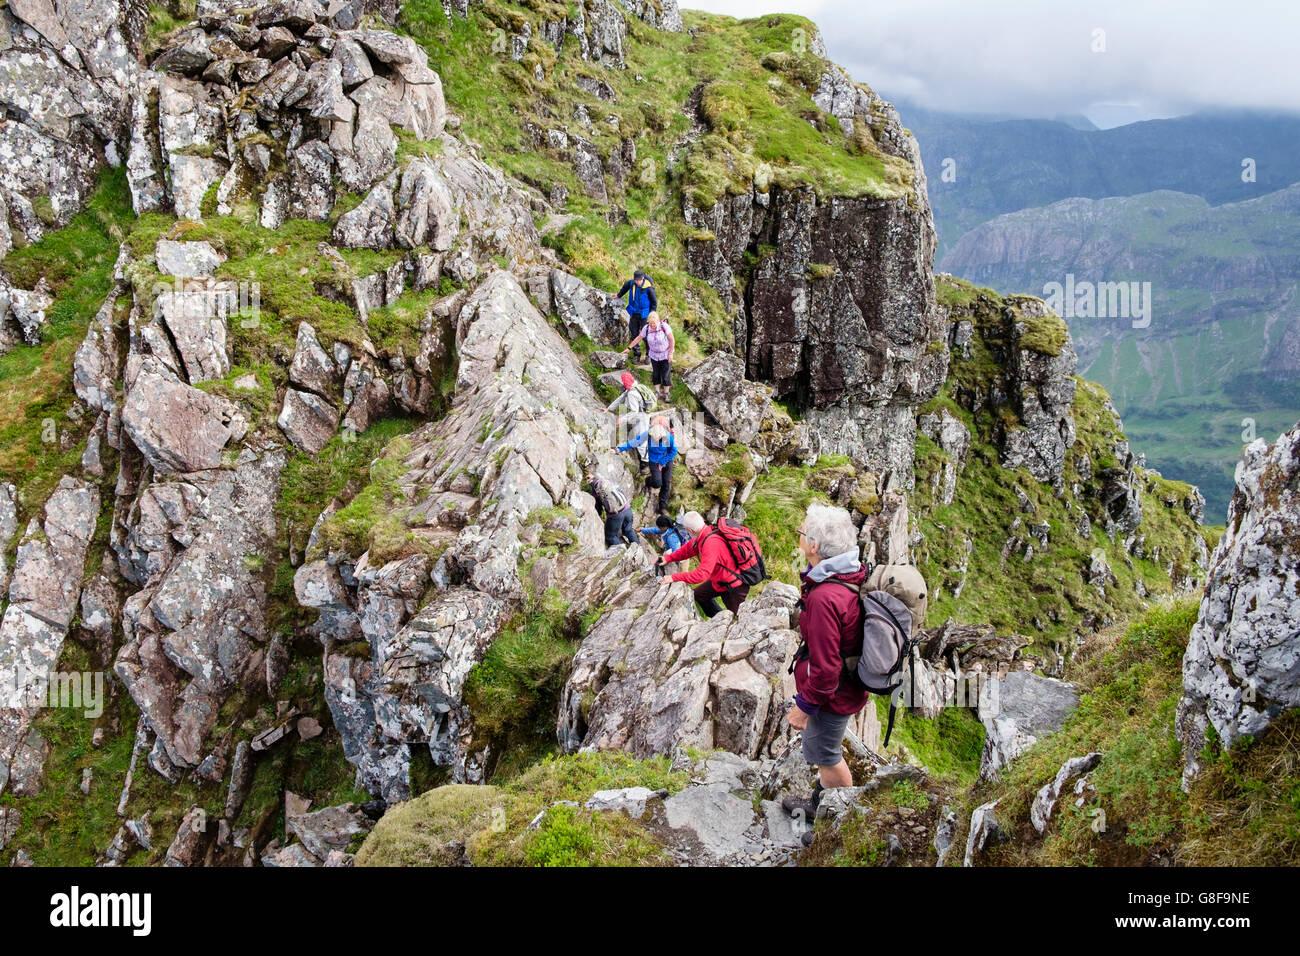 Hikers scrambling on steep rocky pinnacles of Aonach Eagach ridge. Glencoe, Highland, Scotland, UK, Britain - Stock Image